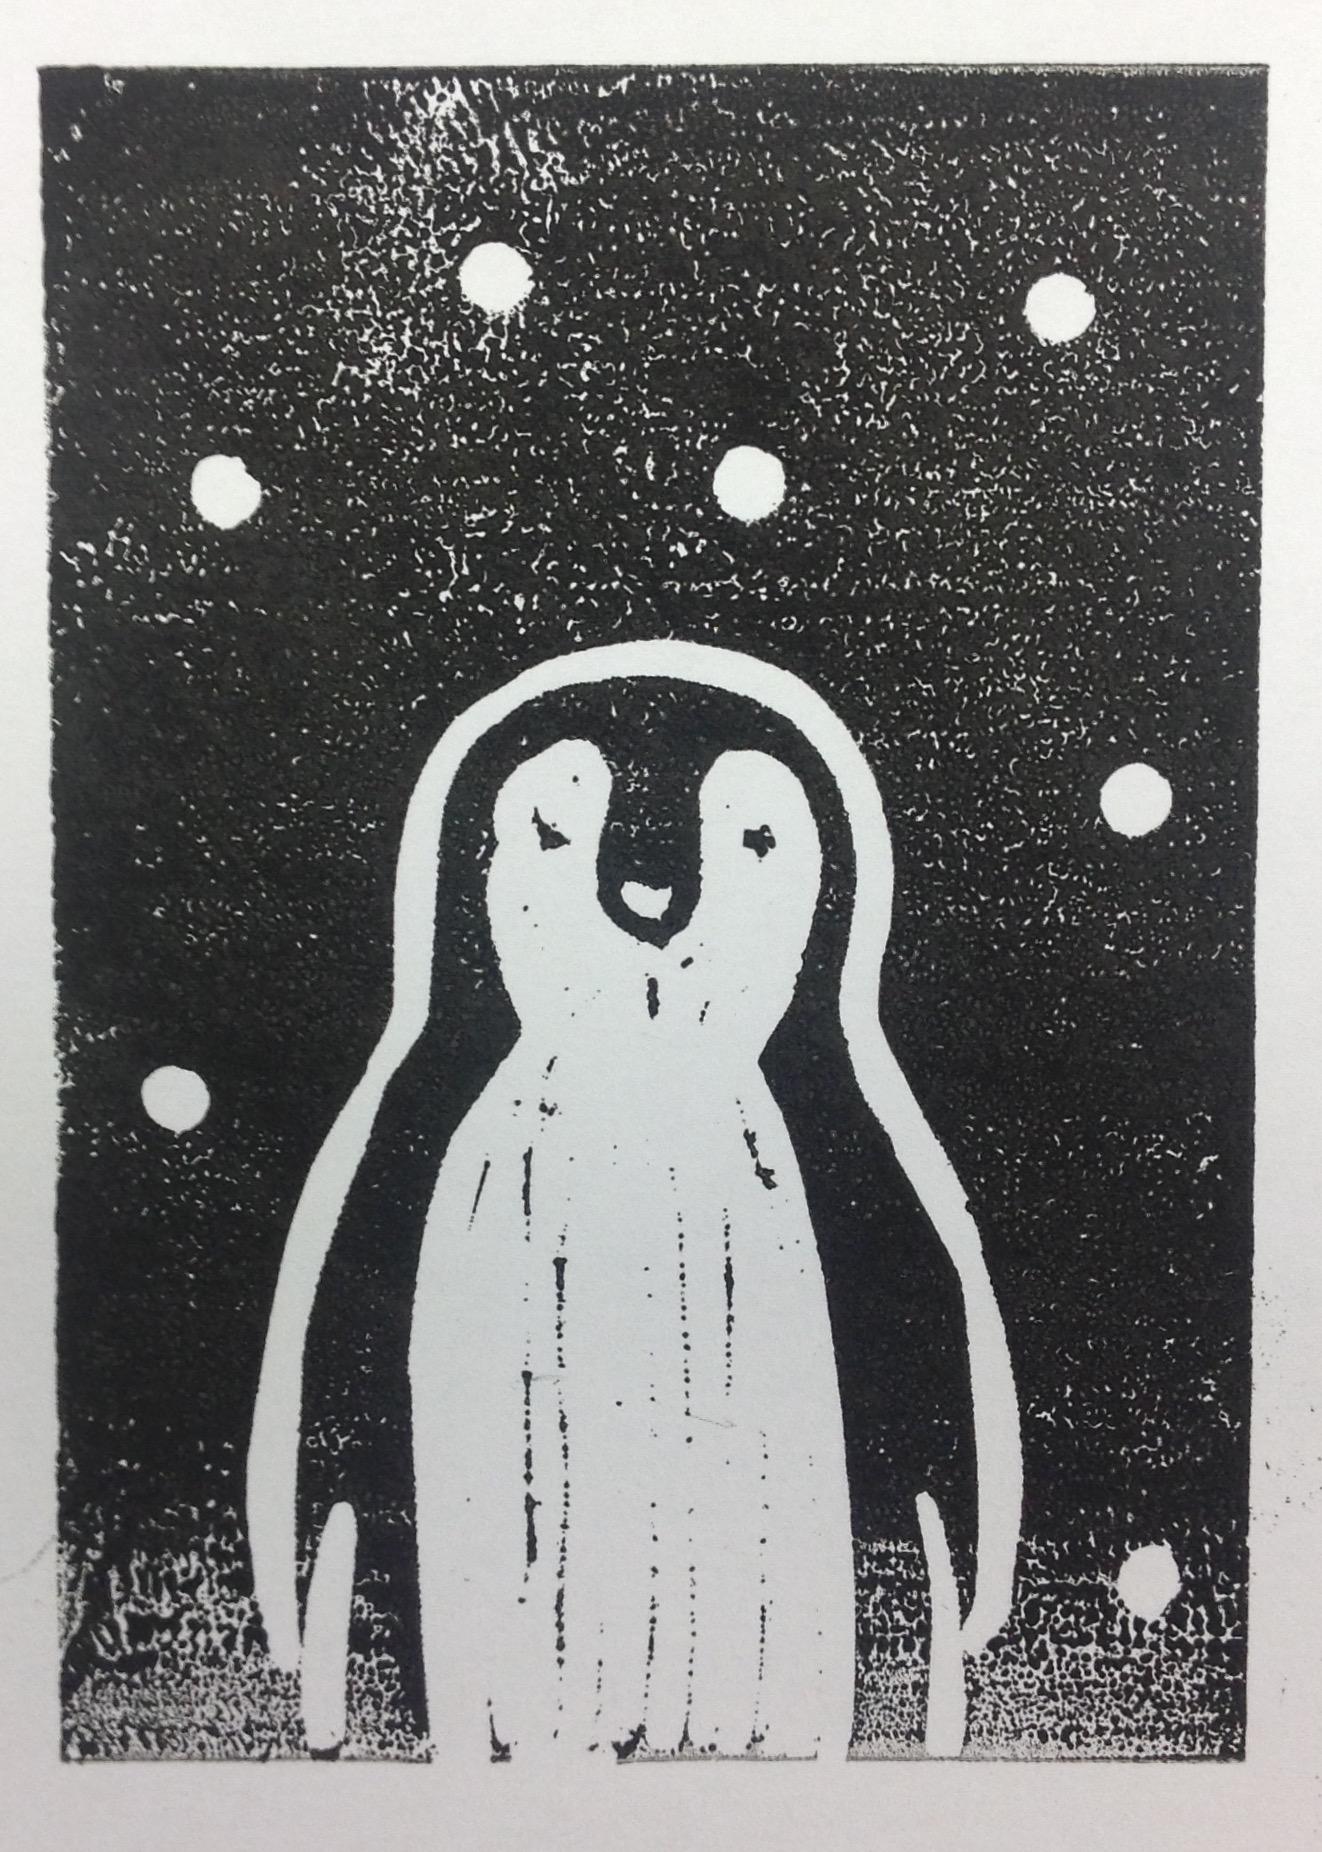 Lino print pengiun